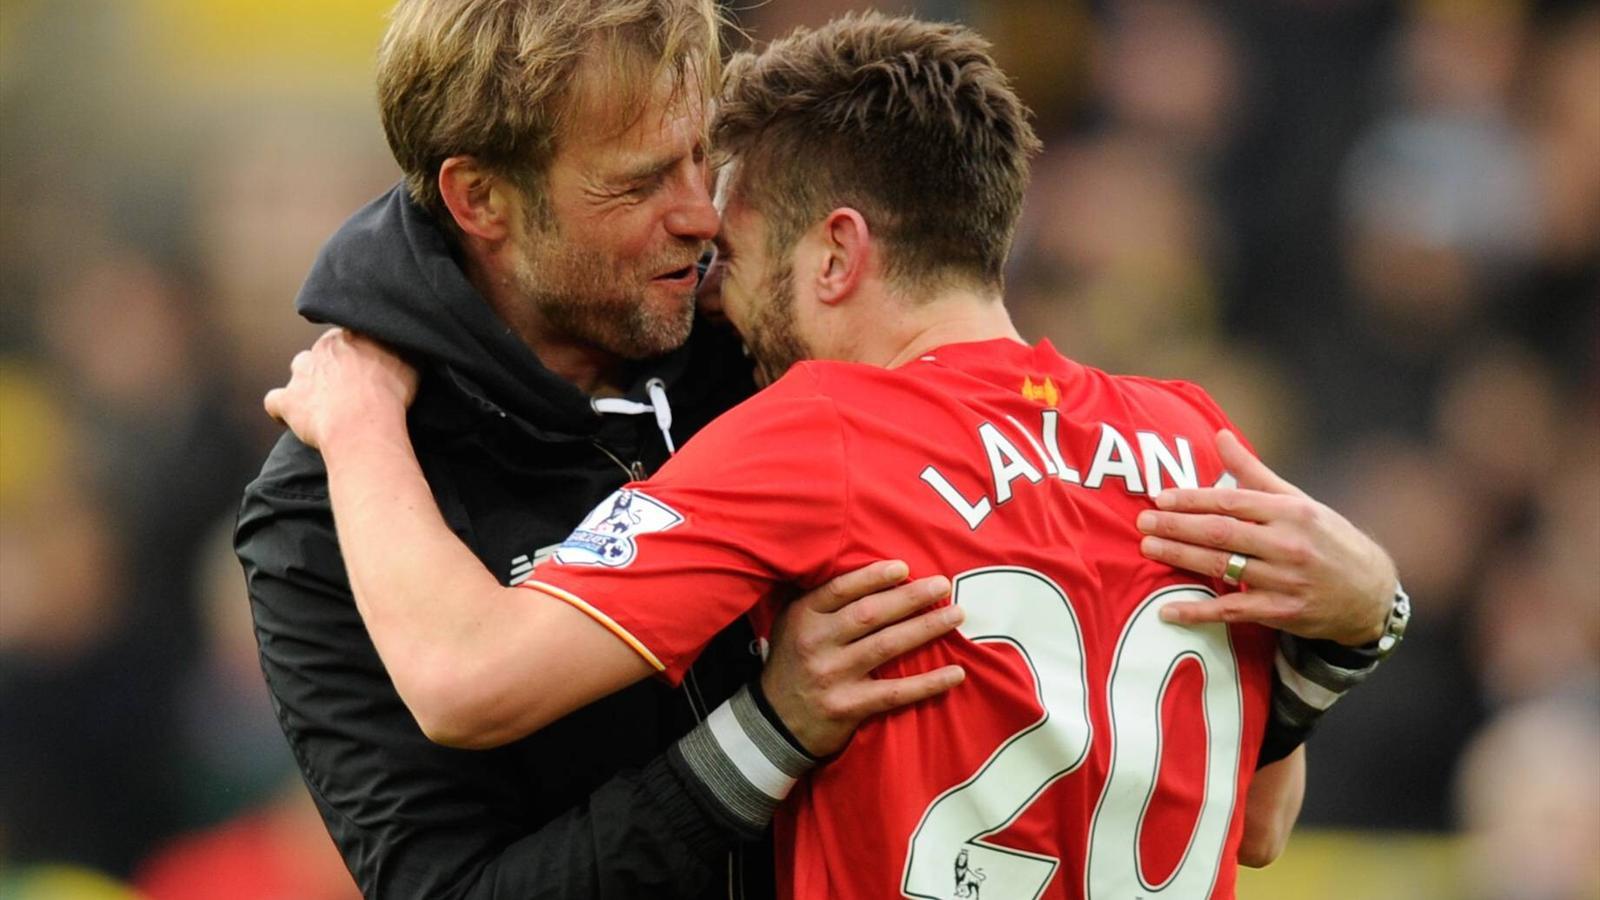 Jürgen Klopp, Adam Lallana, FC Liverpool